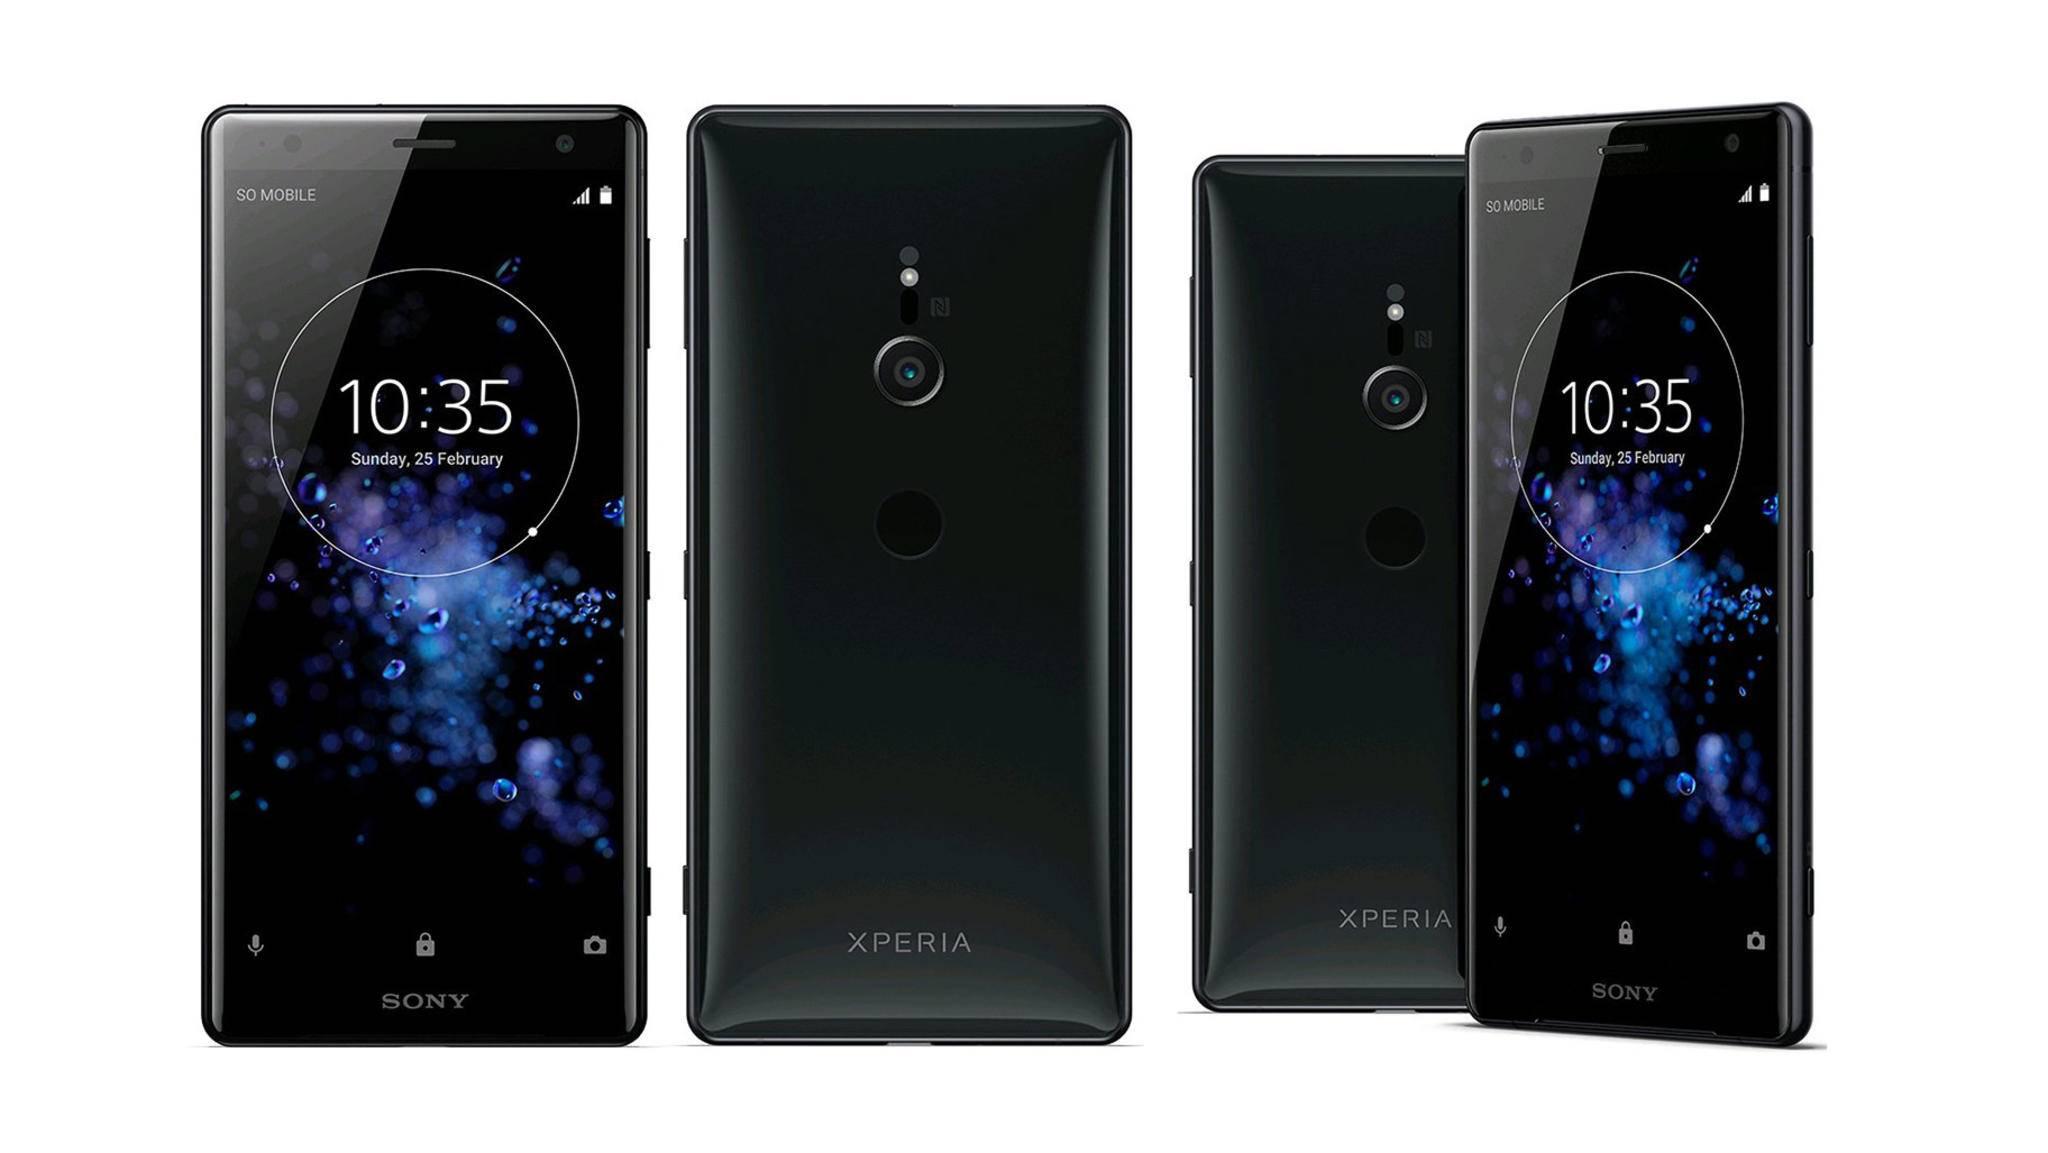 Sony Xperia XZ2 (Compact): Pressebilder & Details durchgesickert